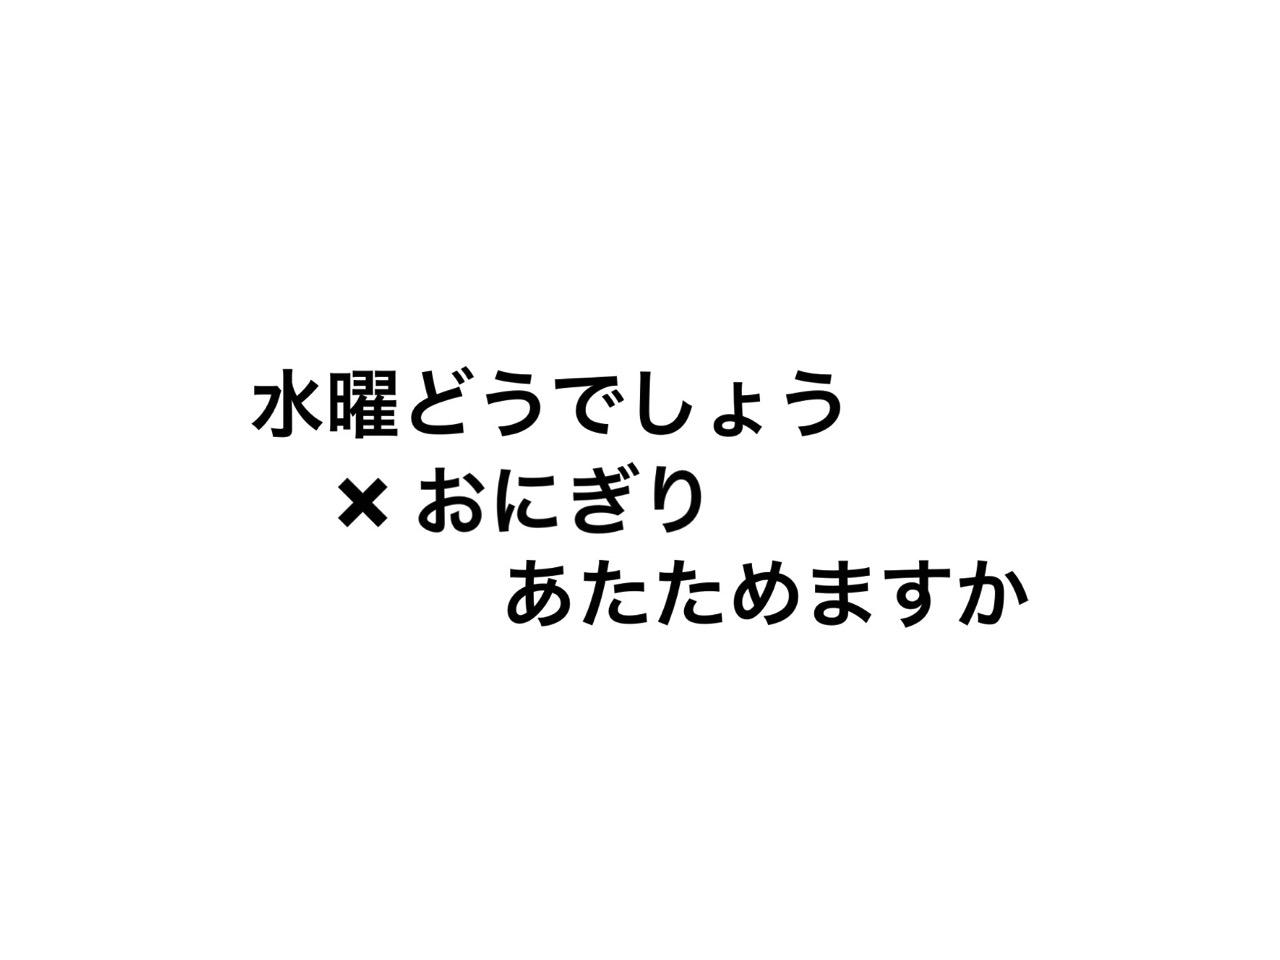 2017 10 02 22 04 05